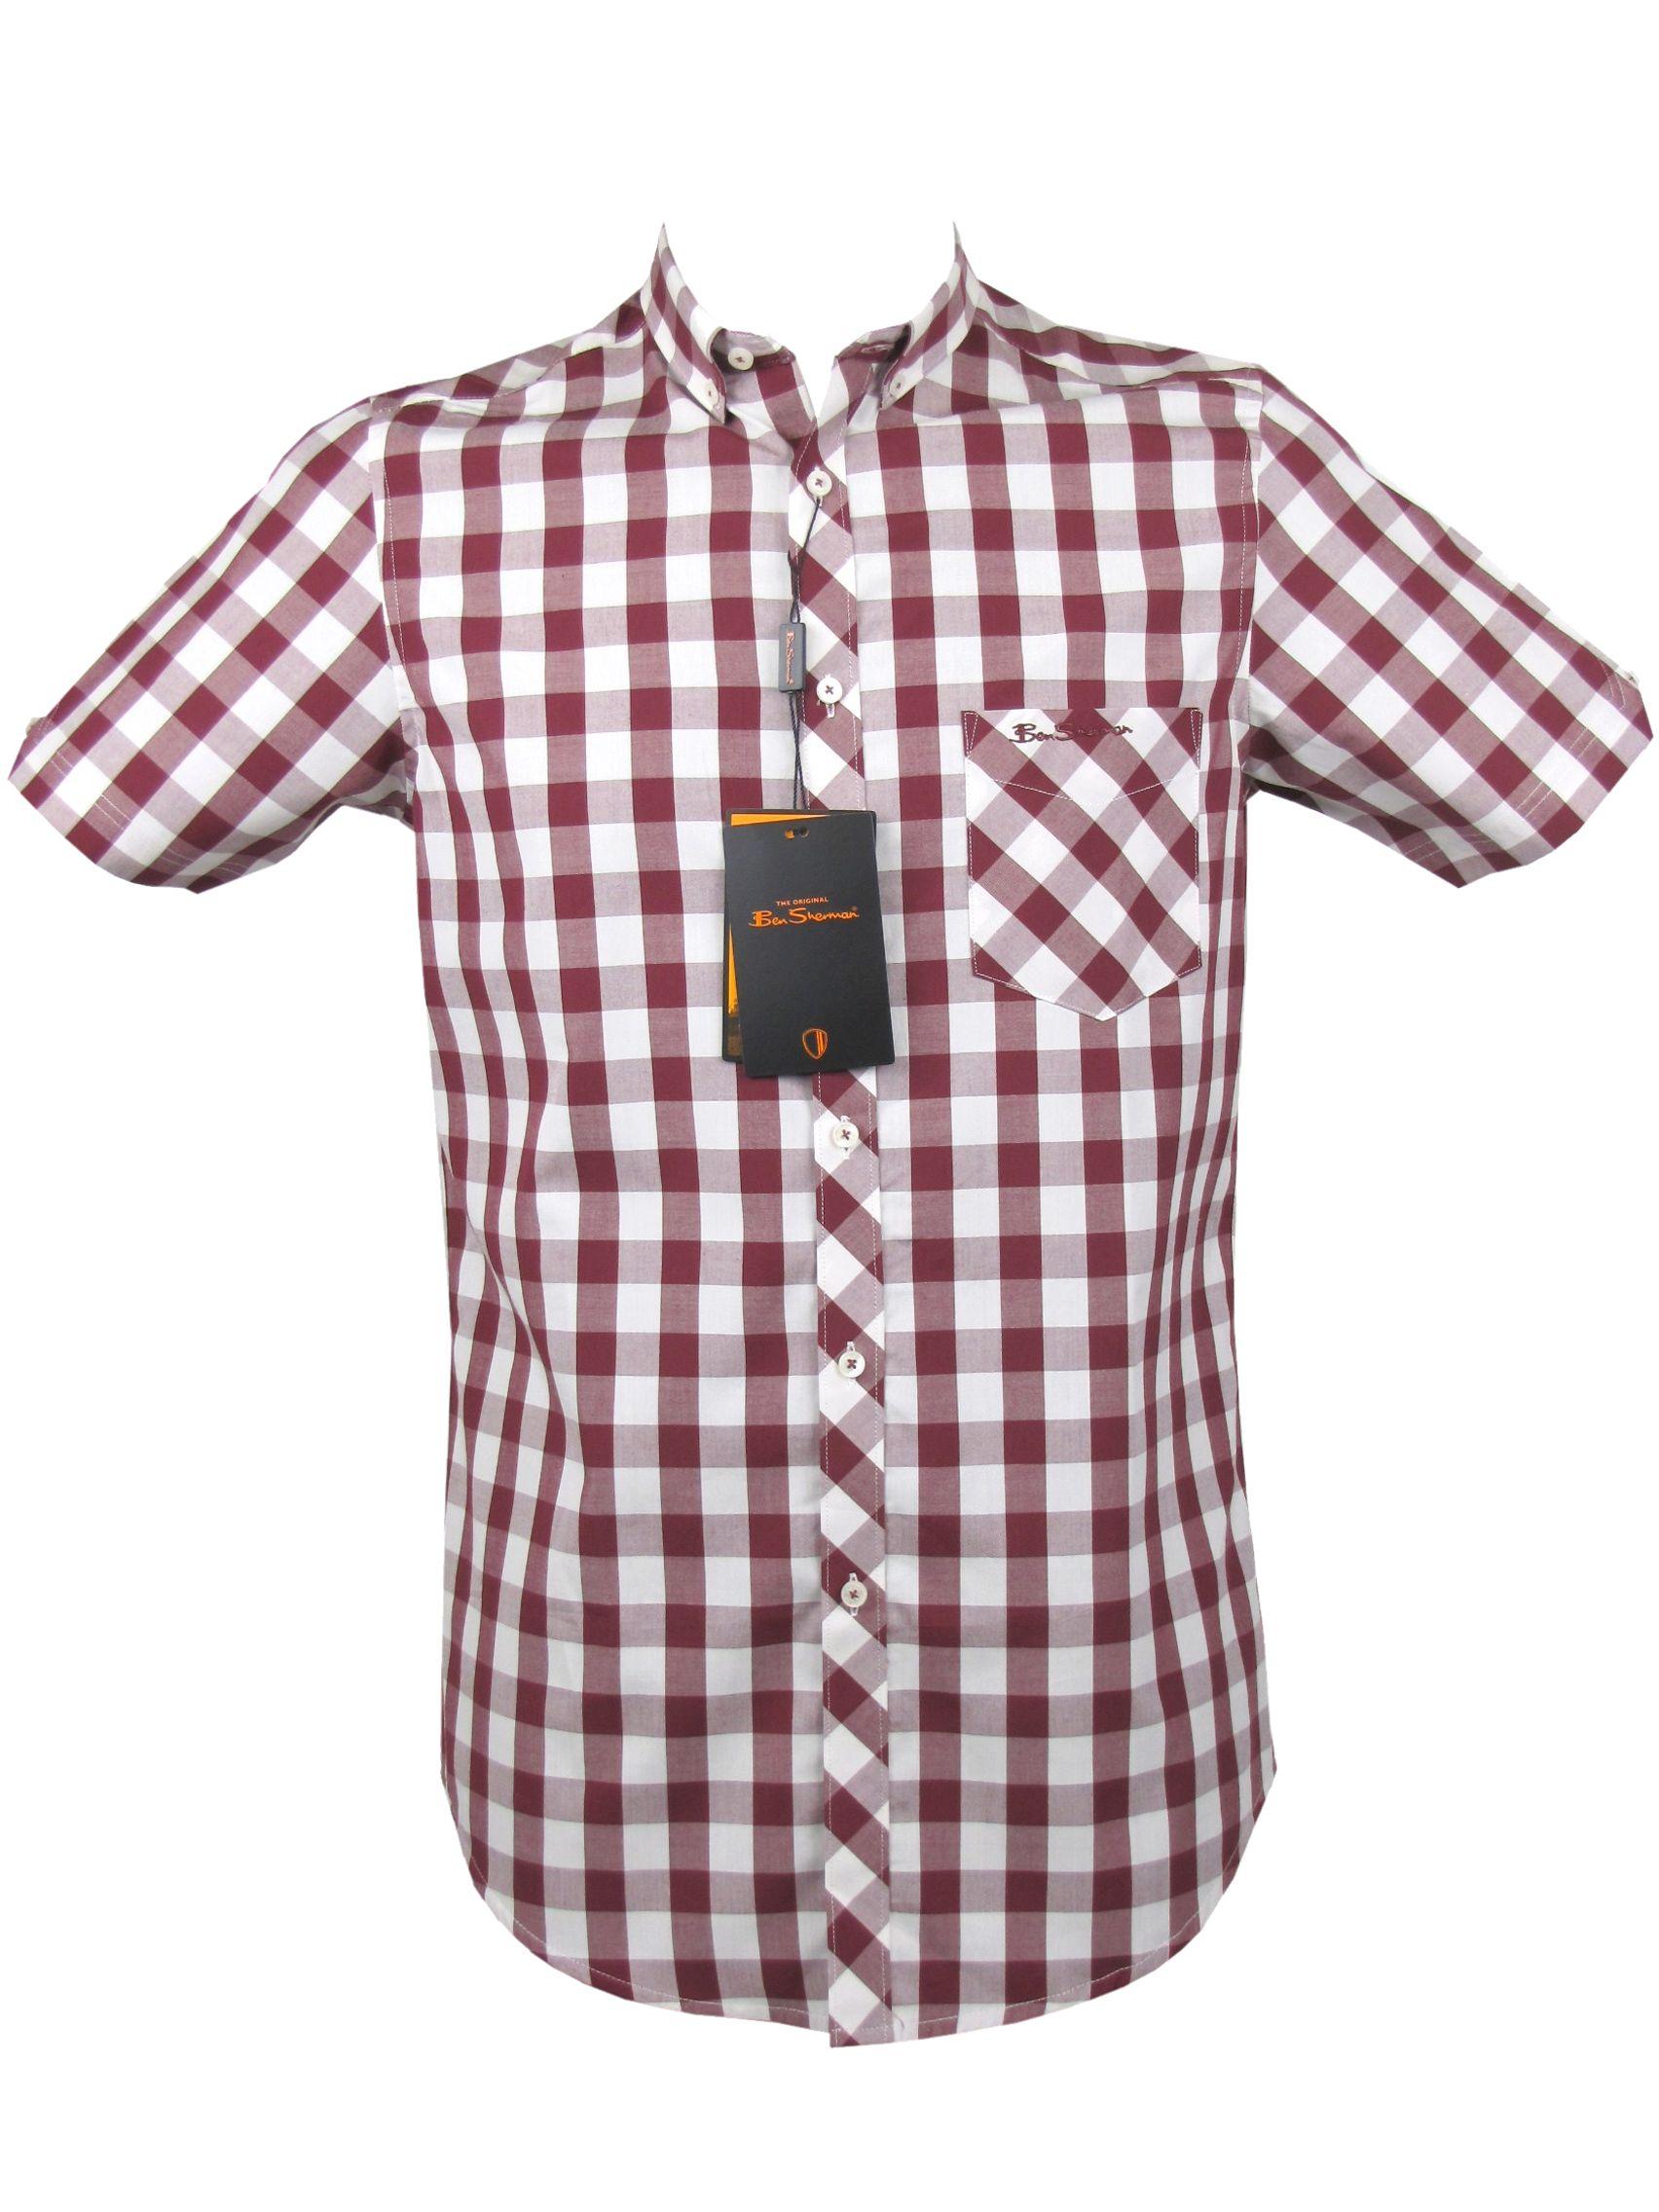 Mens Ben Sherman Shirt S S Mod Style Big Gingham Red Check